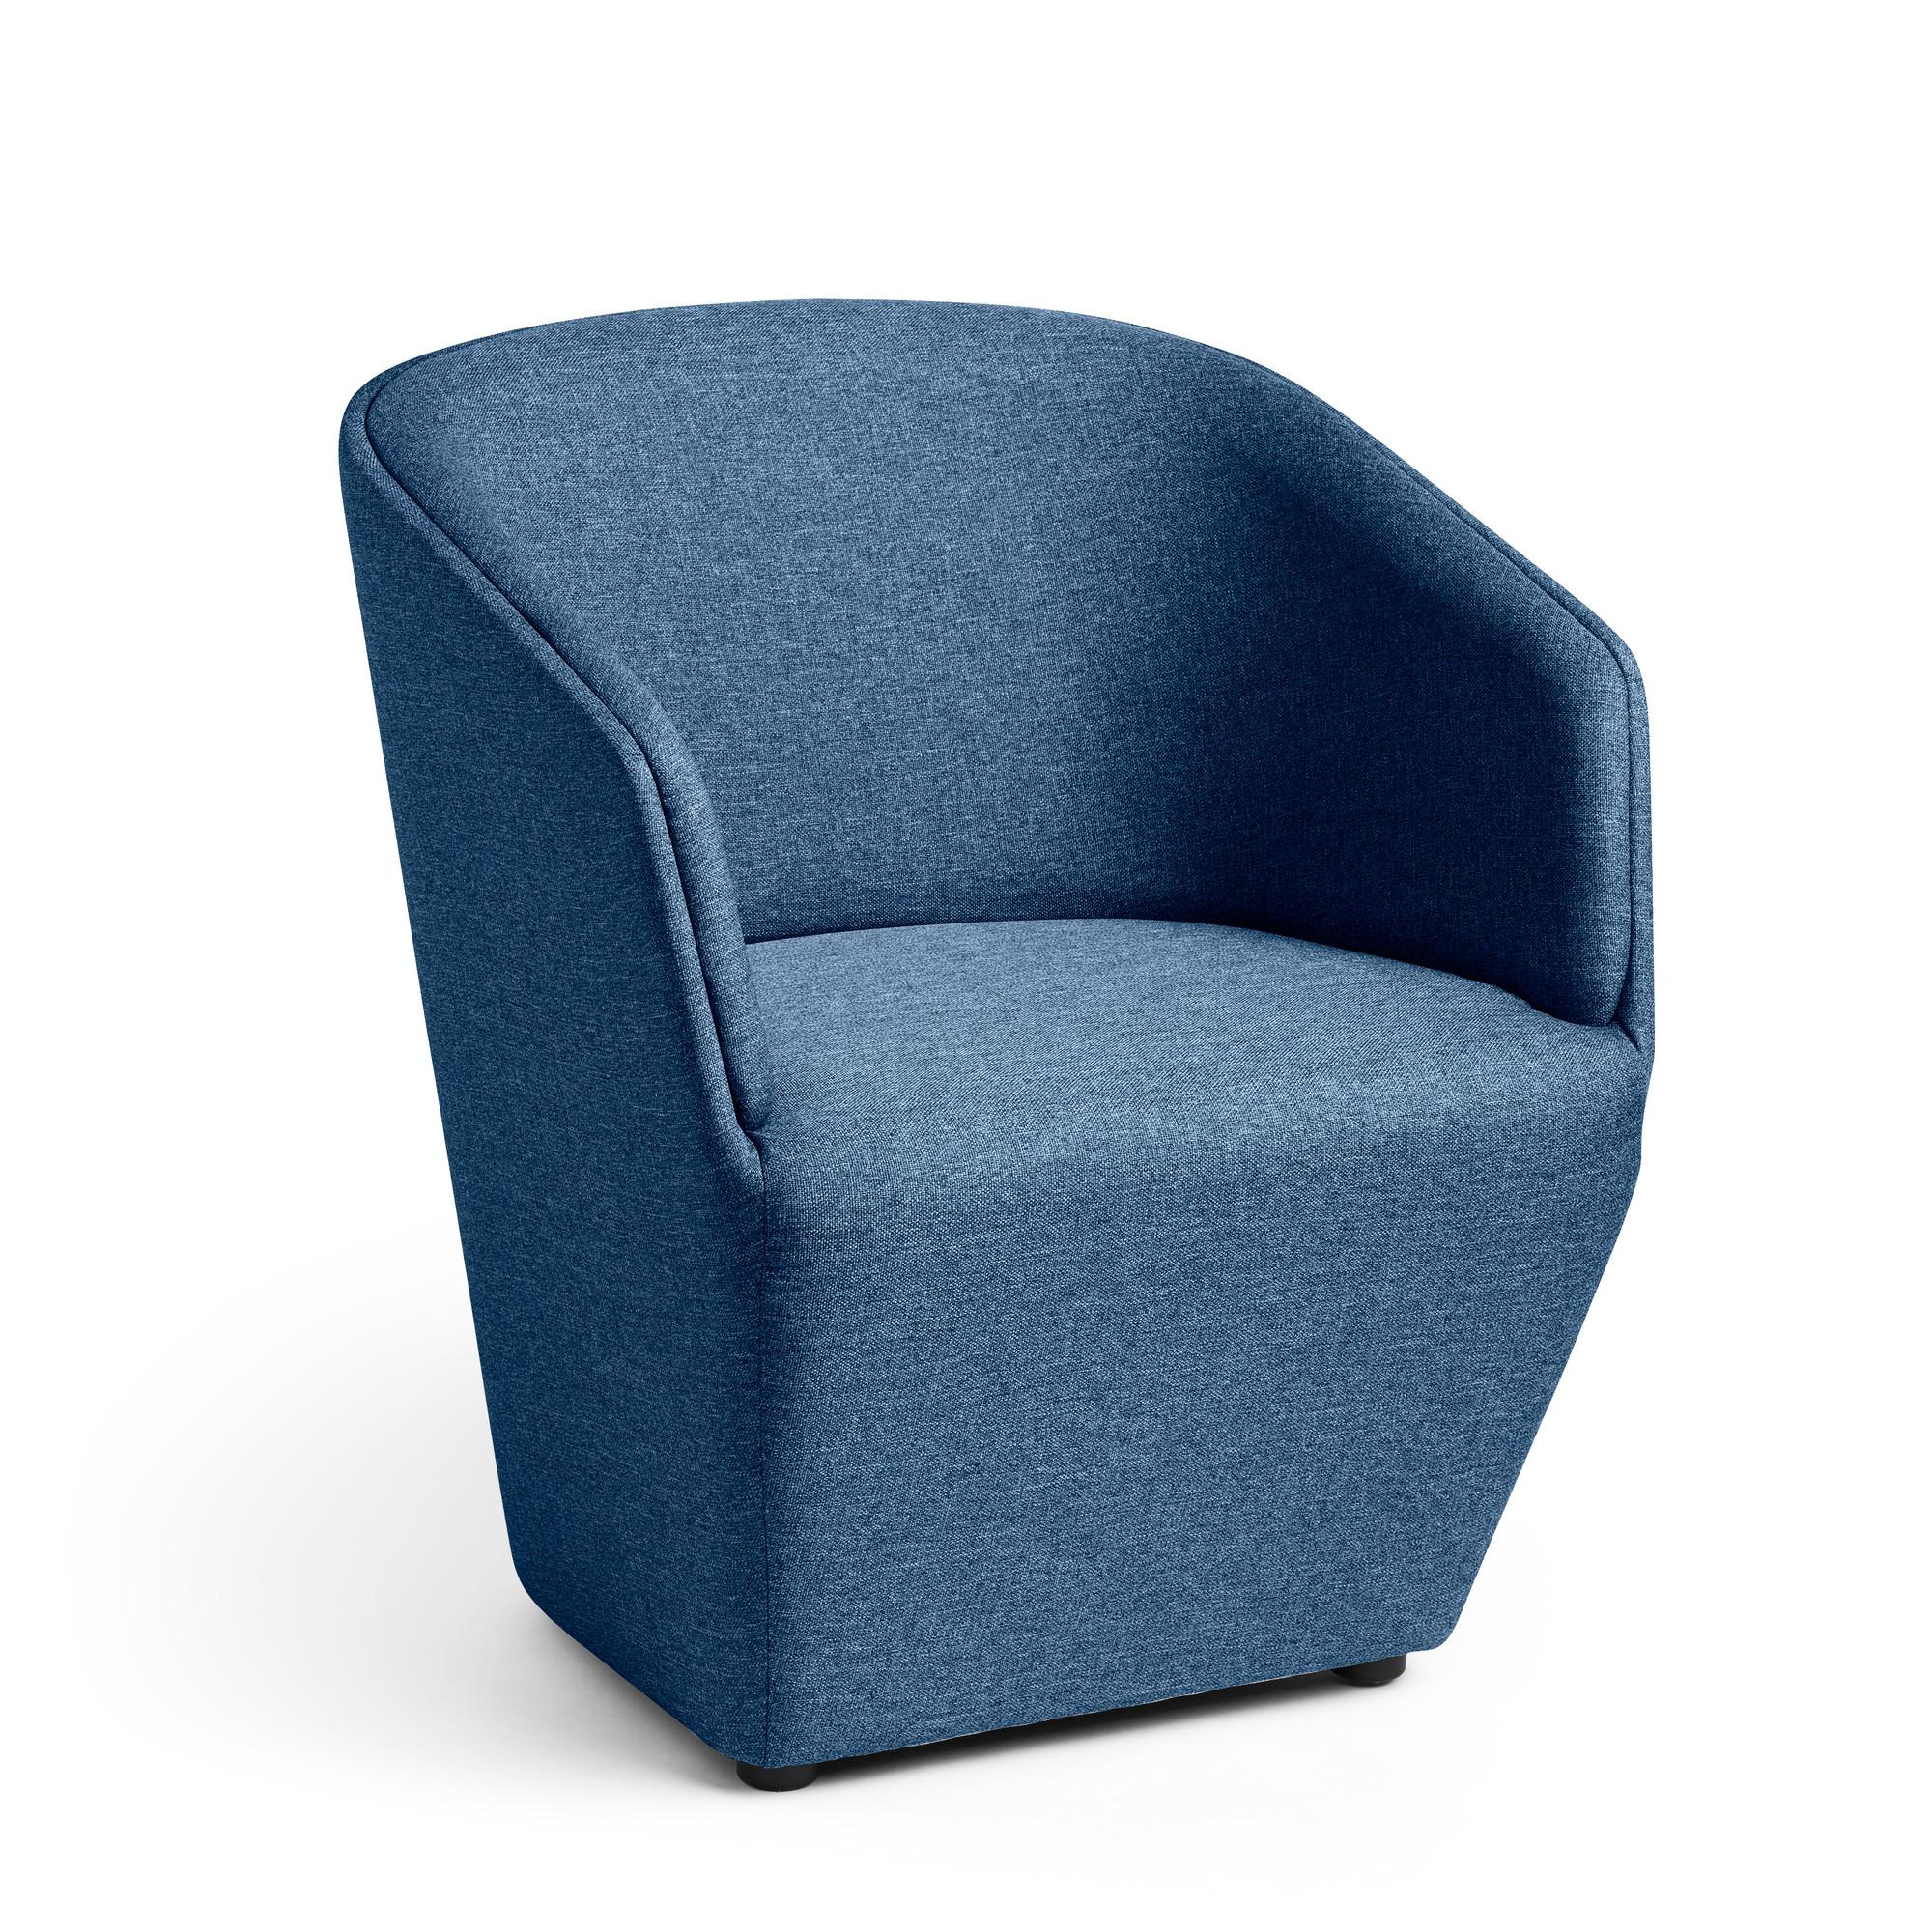 Dark Blue Pitch Club Chair Lounge Seating